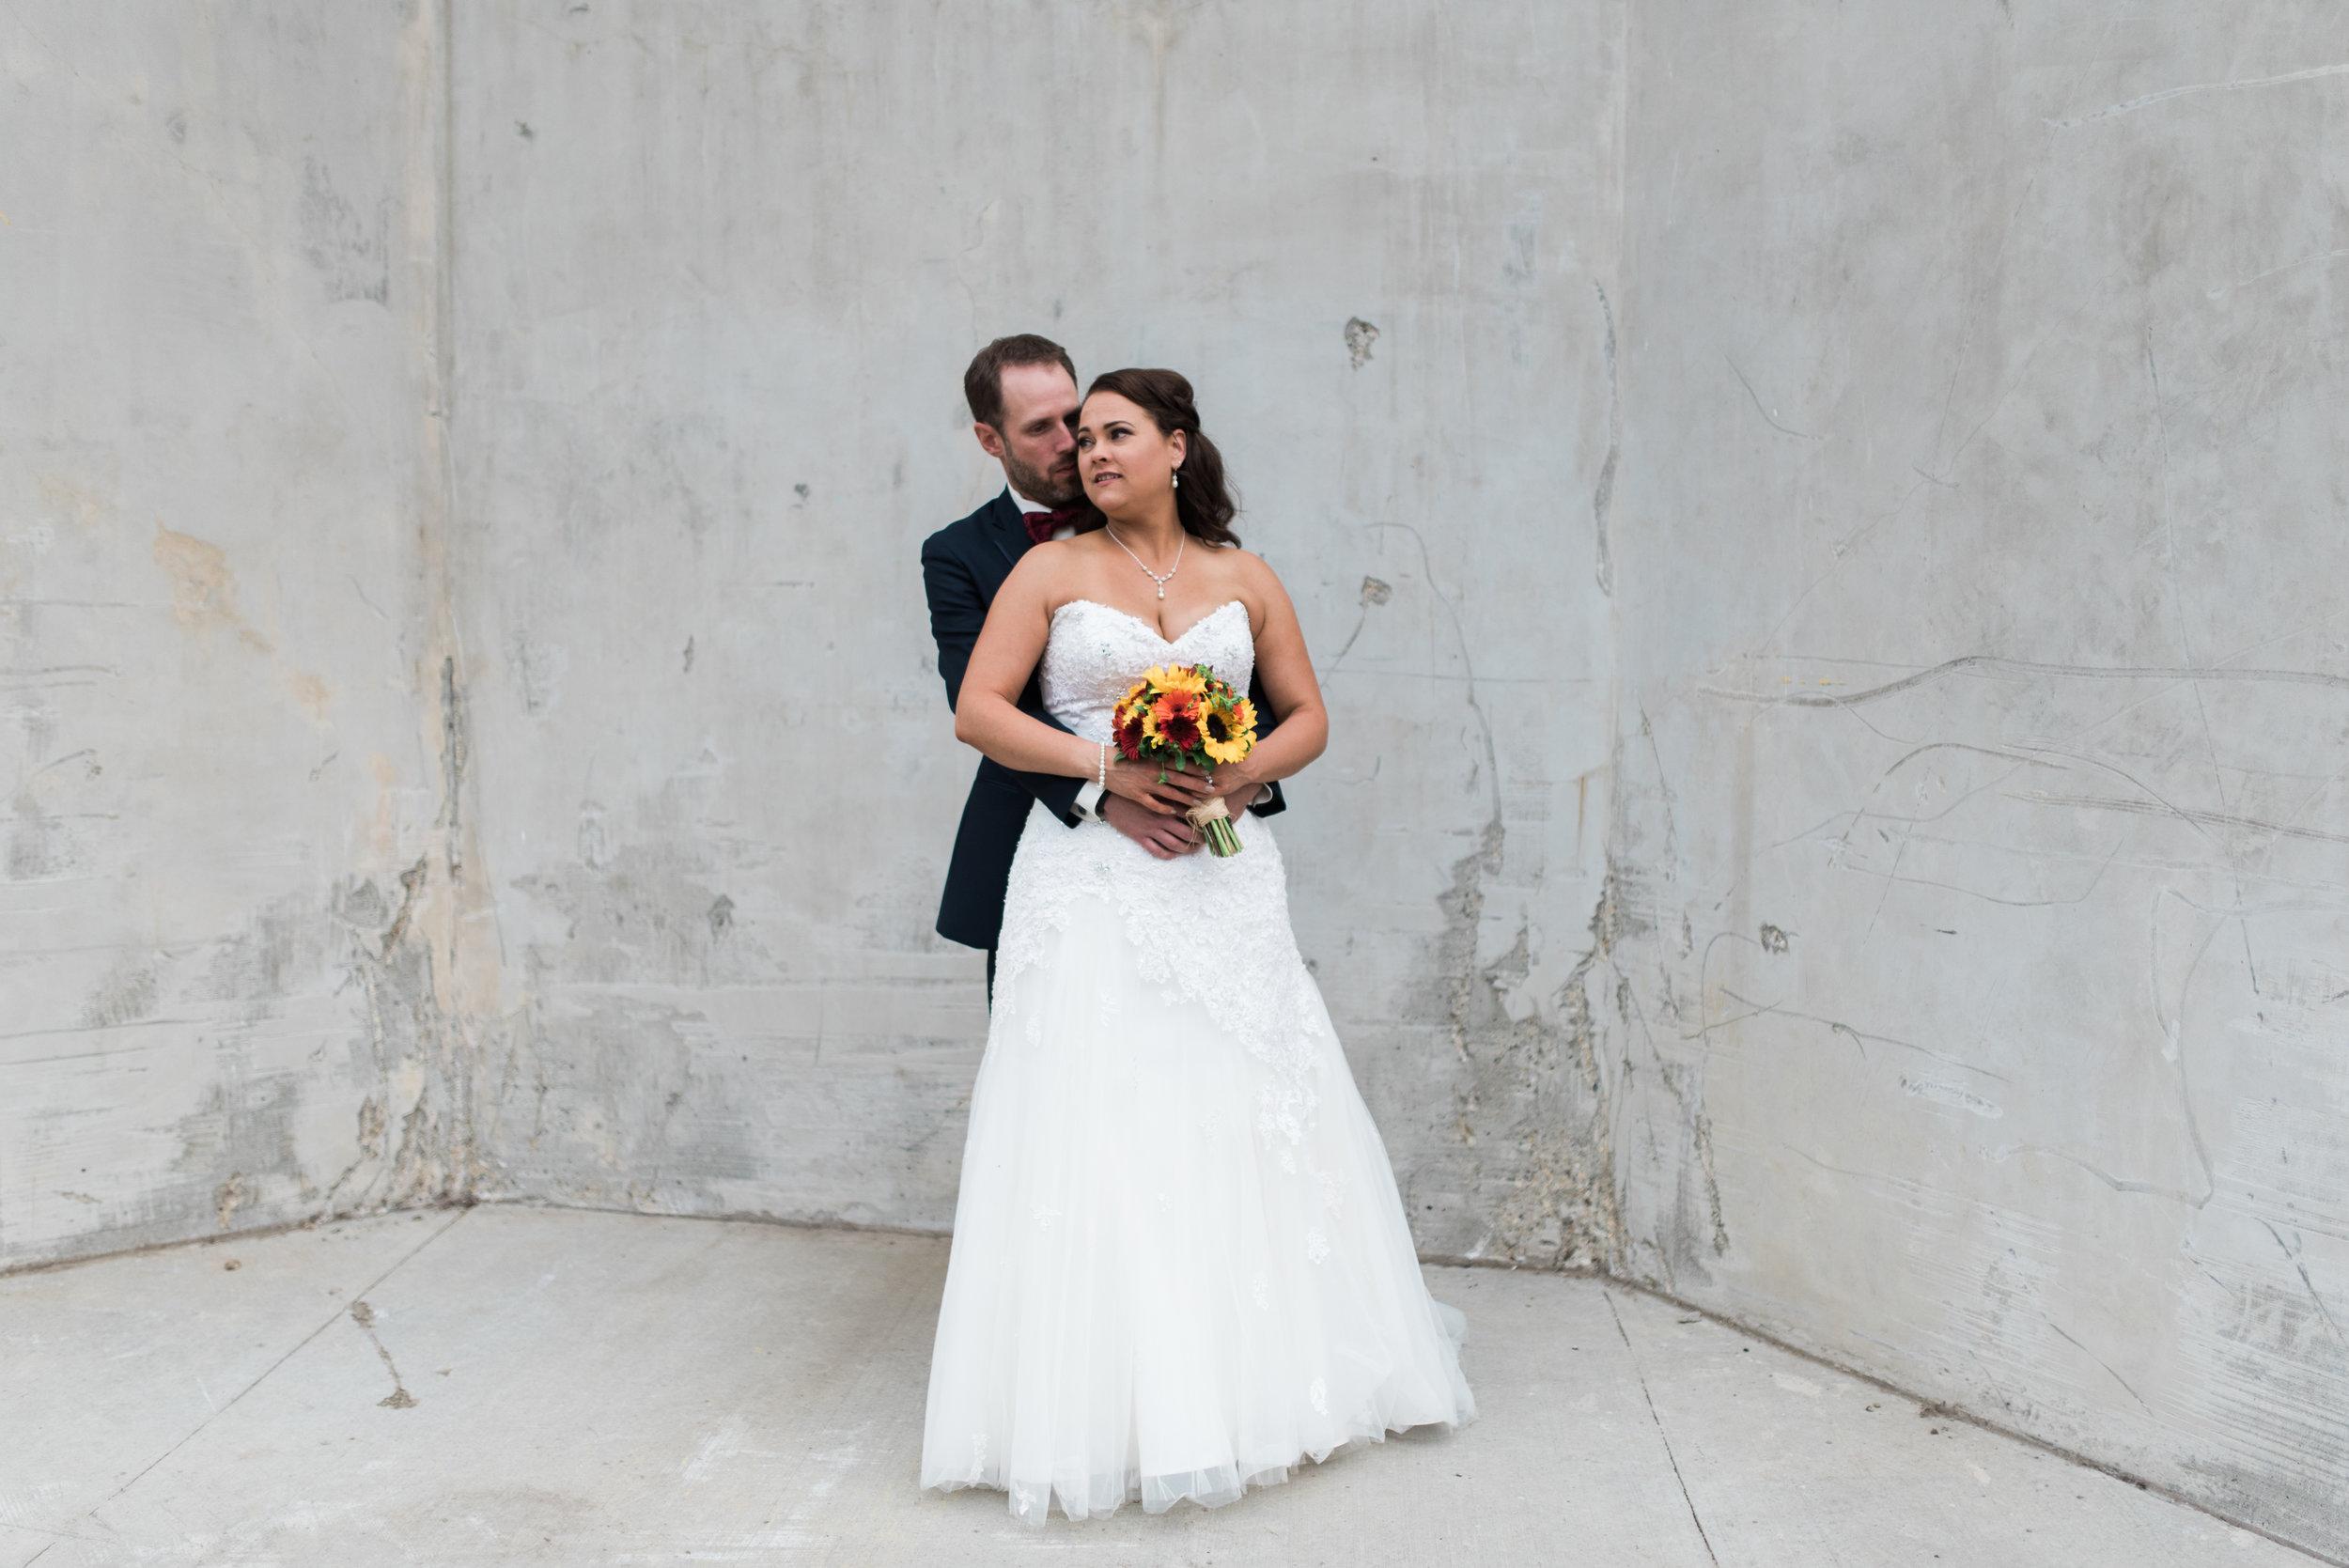 J M Wedding 3046.jpg